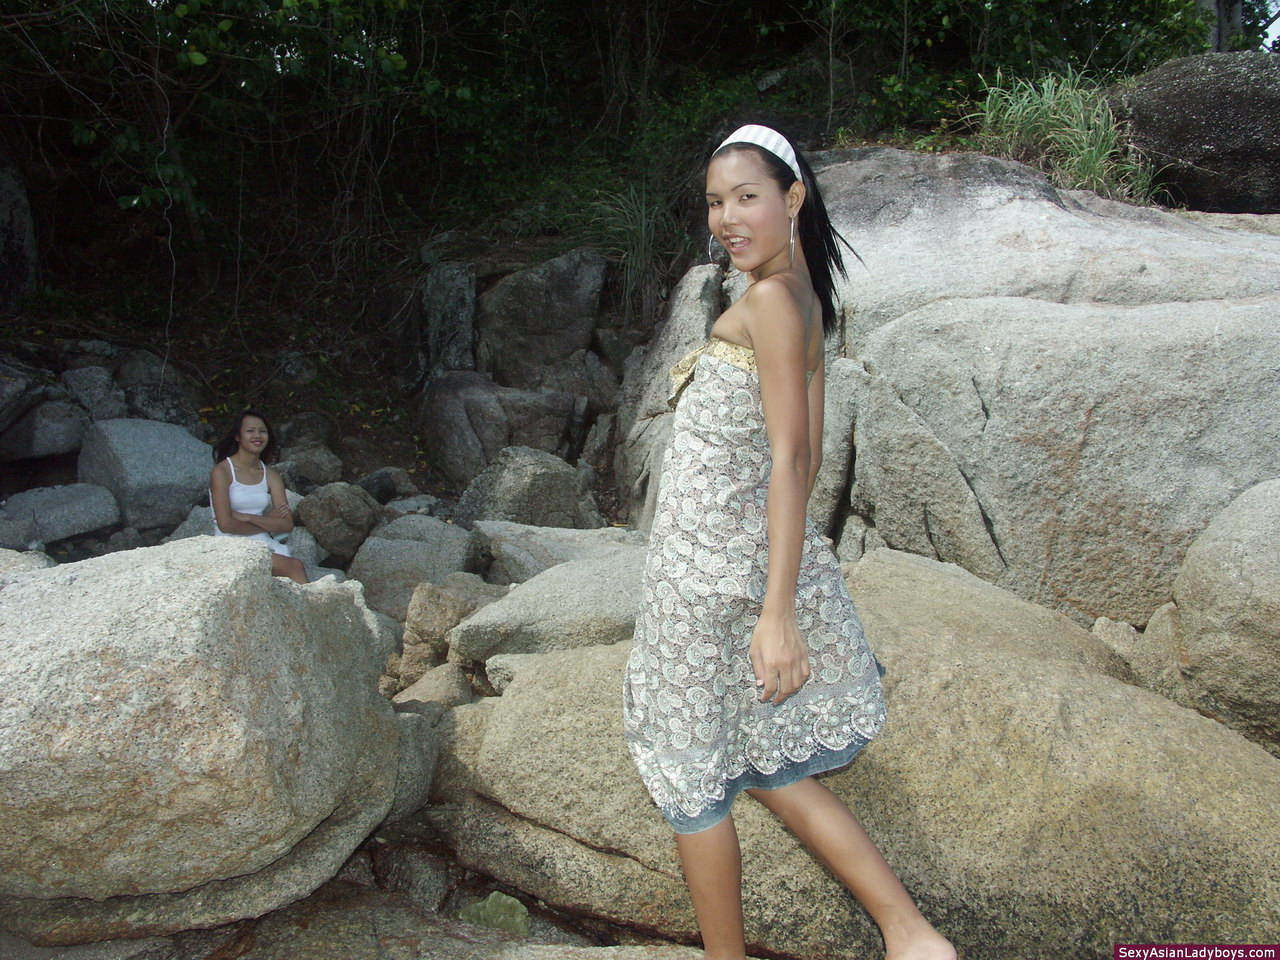 Public wank asian ts naked adult ladygallery big